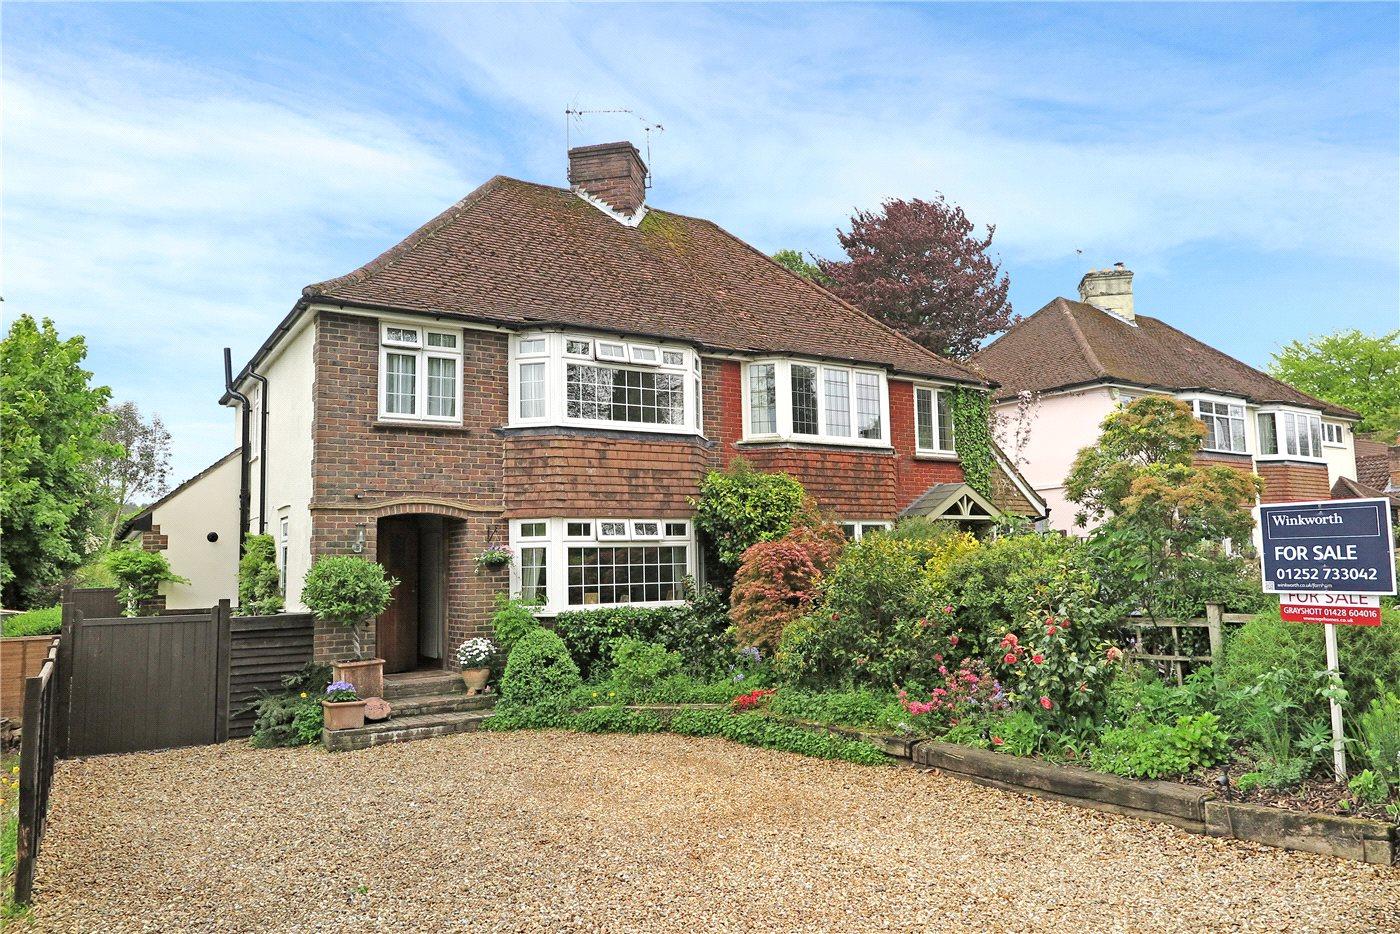 3 Bedroom Property For Sale In Whitmore Vale Road Grayshott